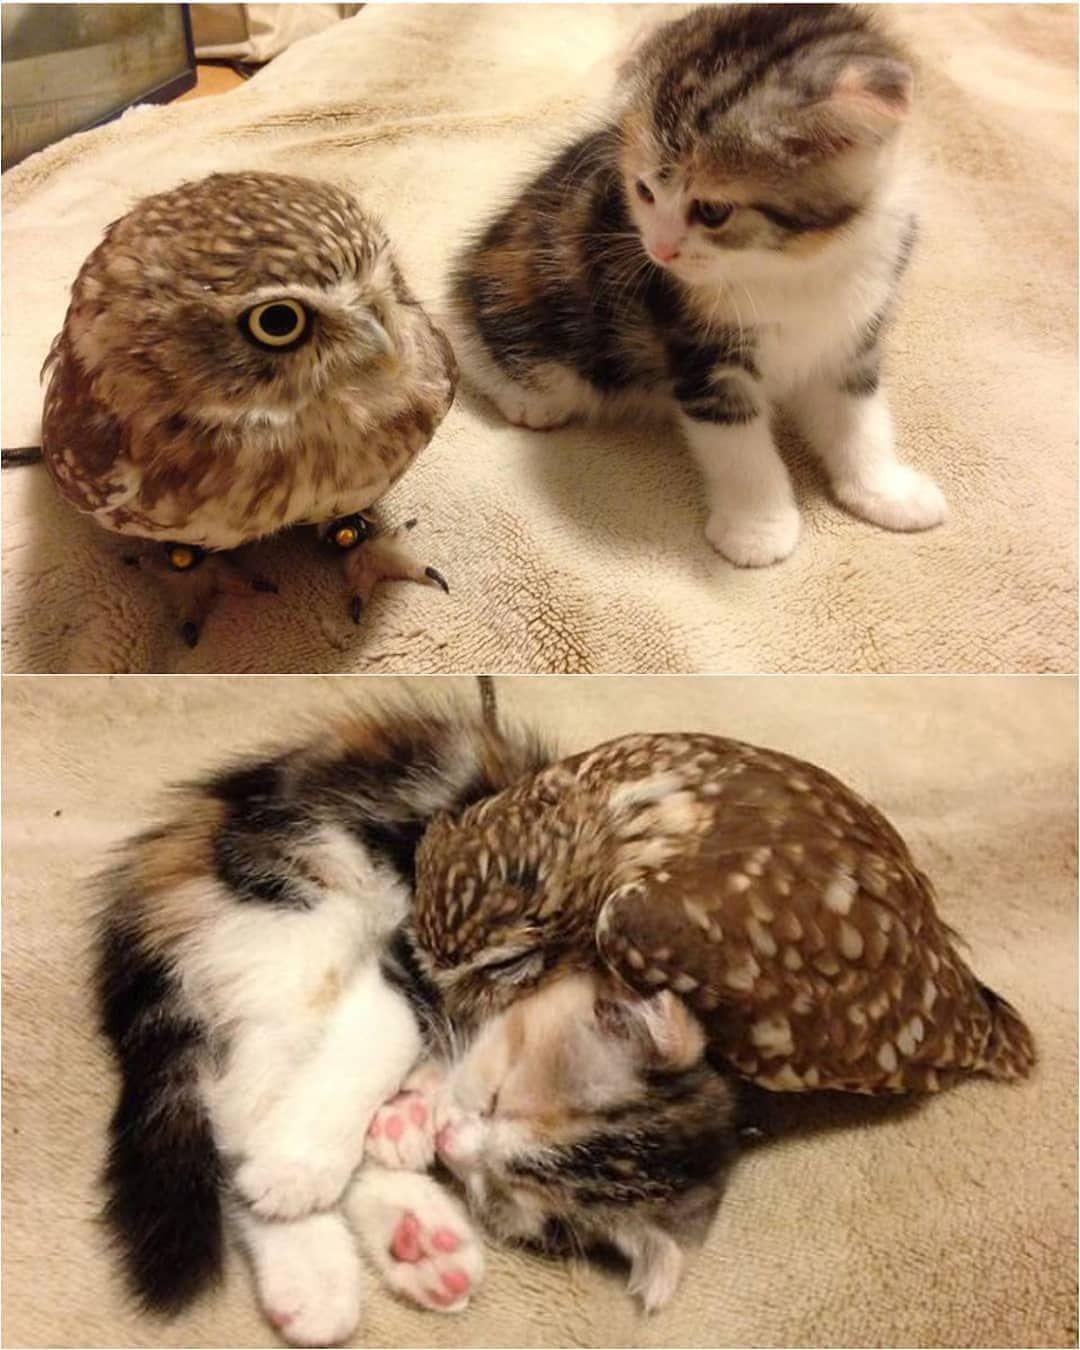 Animal On Planet On Instagram Baby Owl Has A New Cousin Photo By Hukumari296 Tag Animalonplanet For A F Roliga Djurbilder Sotaste Djuren Kattungar